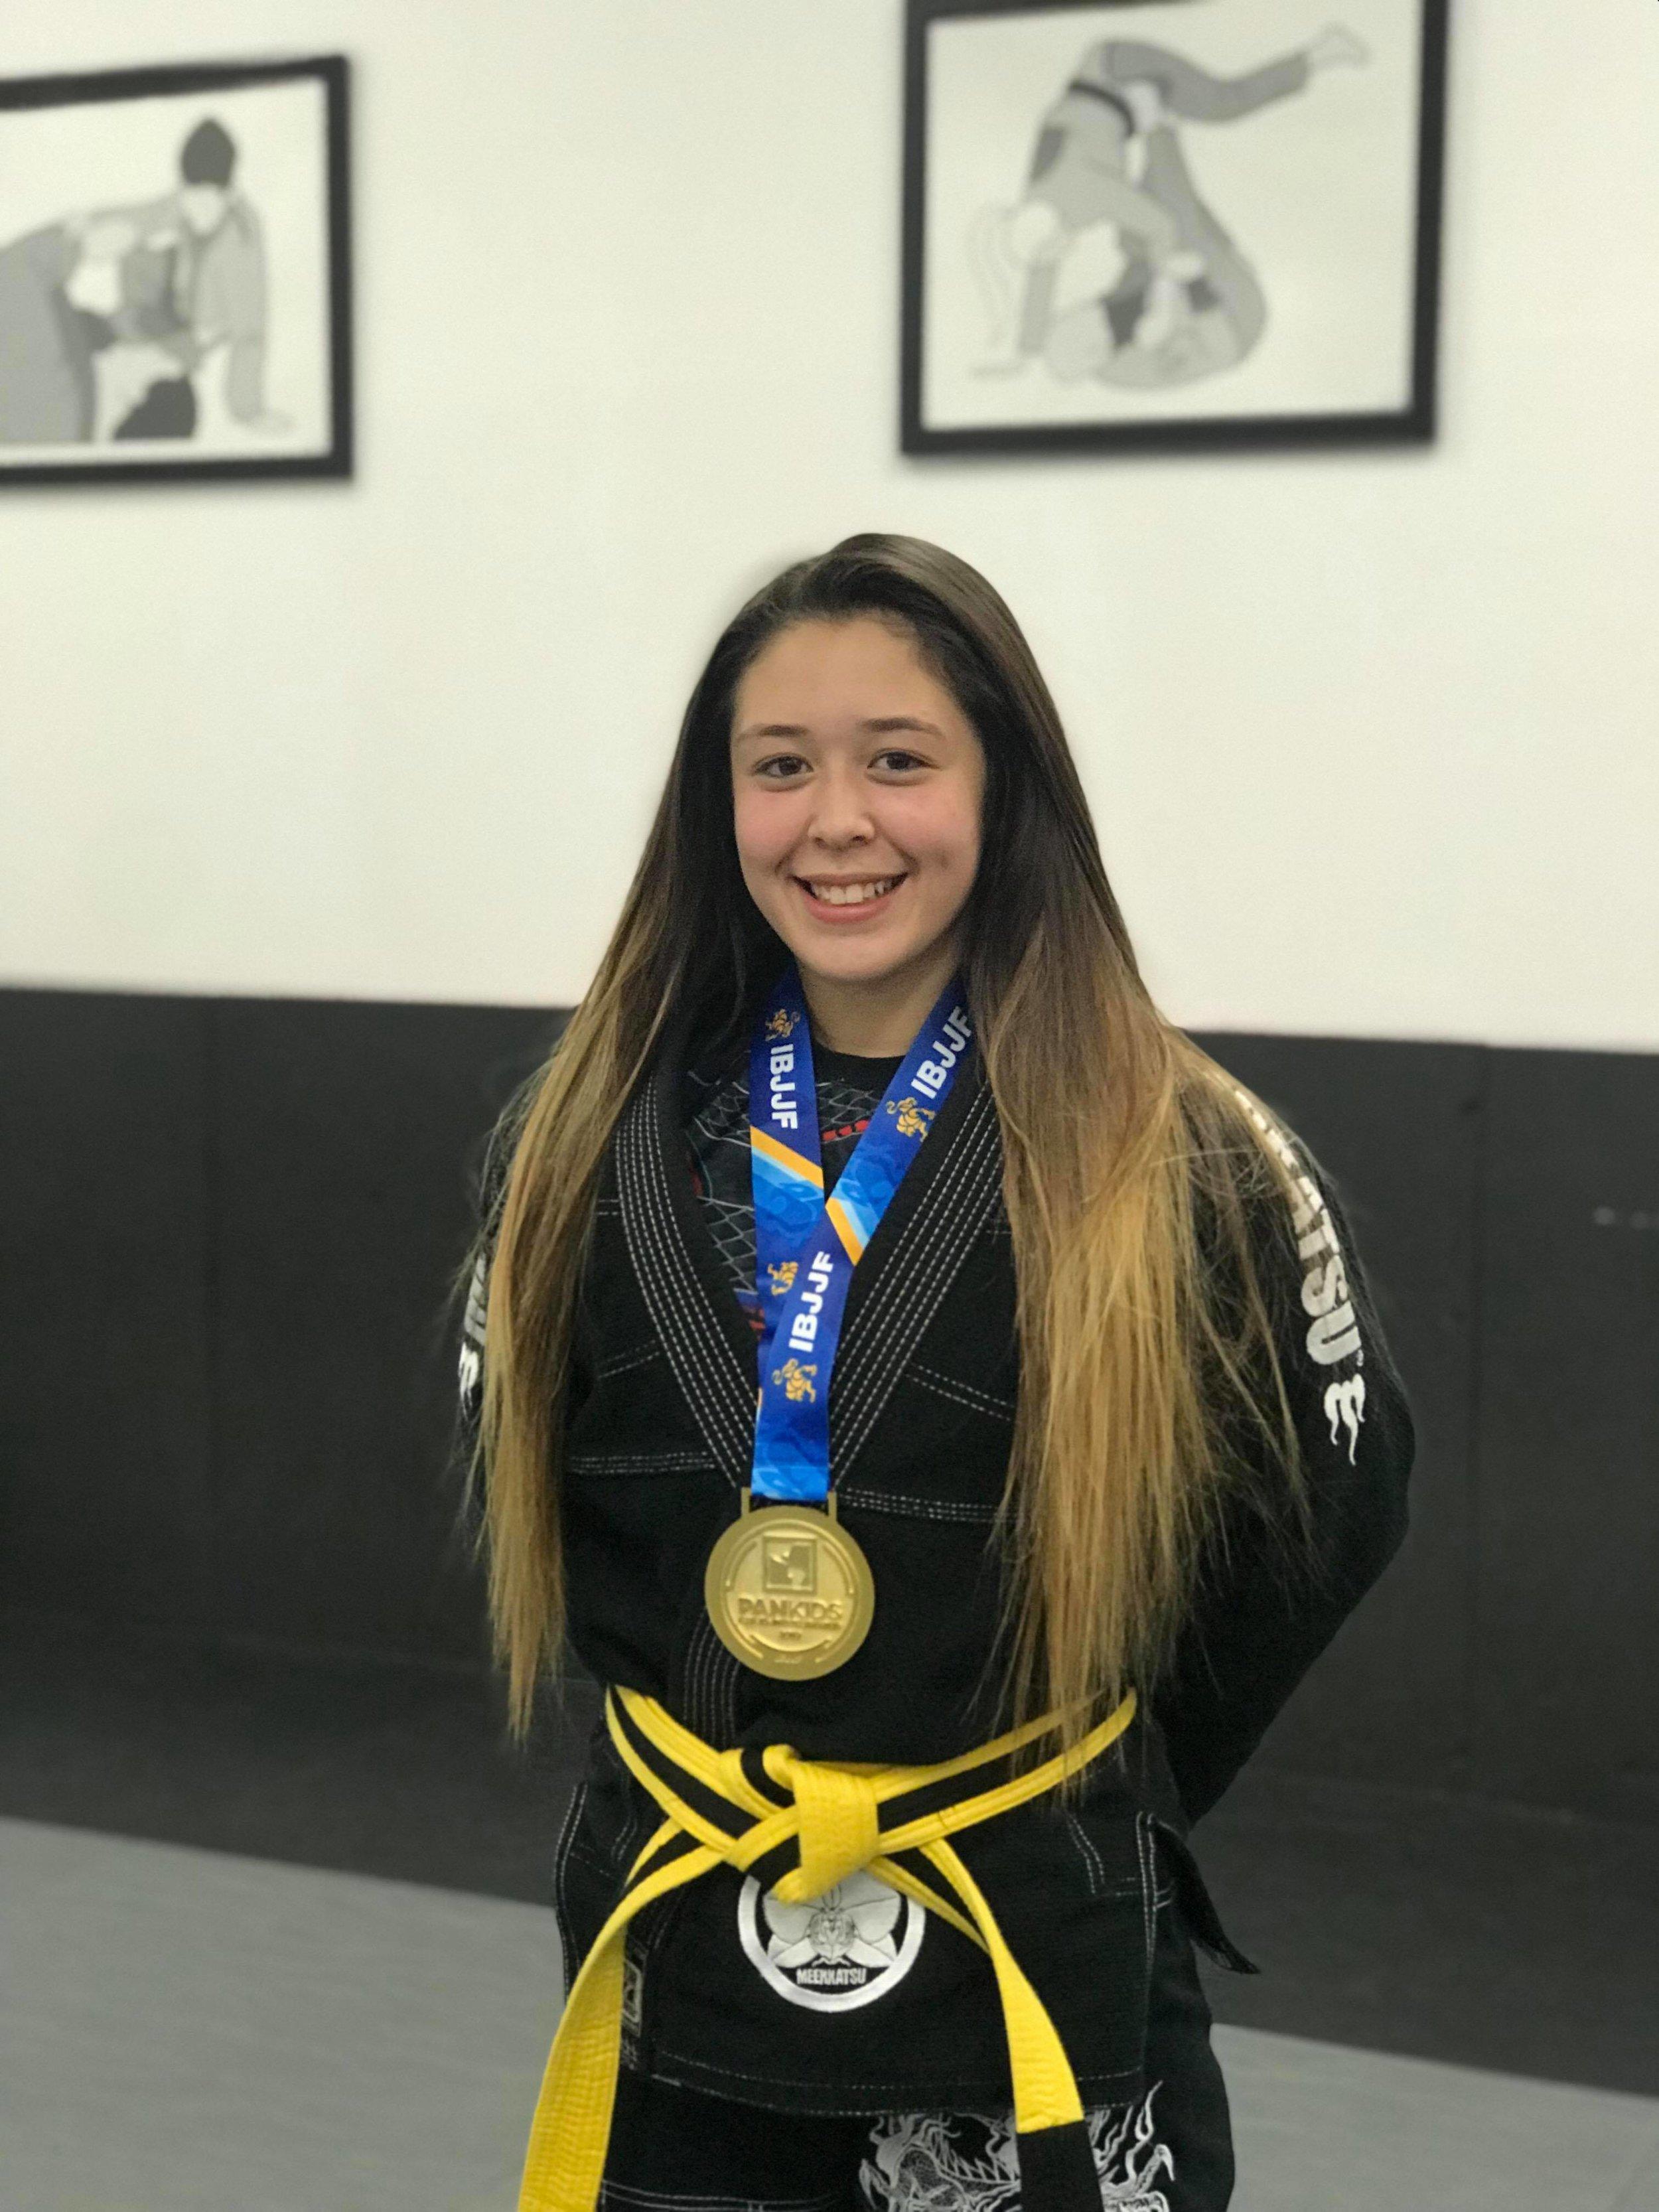 Pan Am jiu jitsu champion